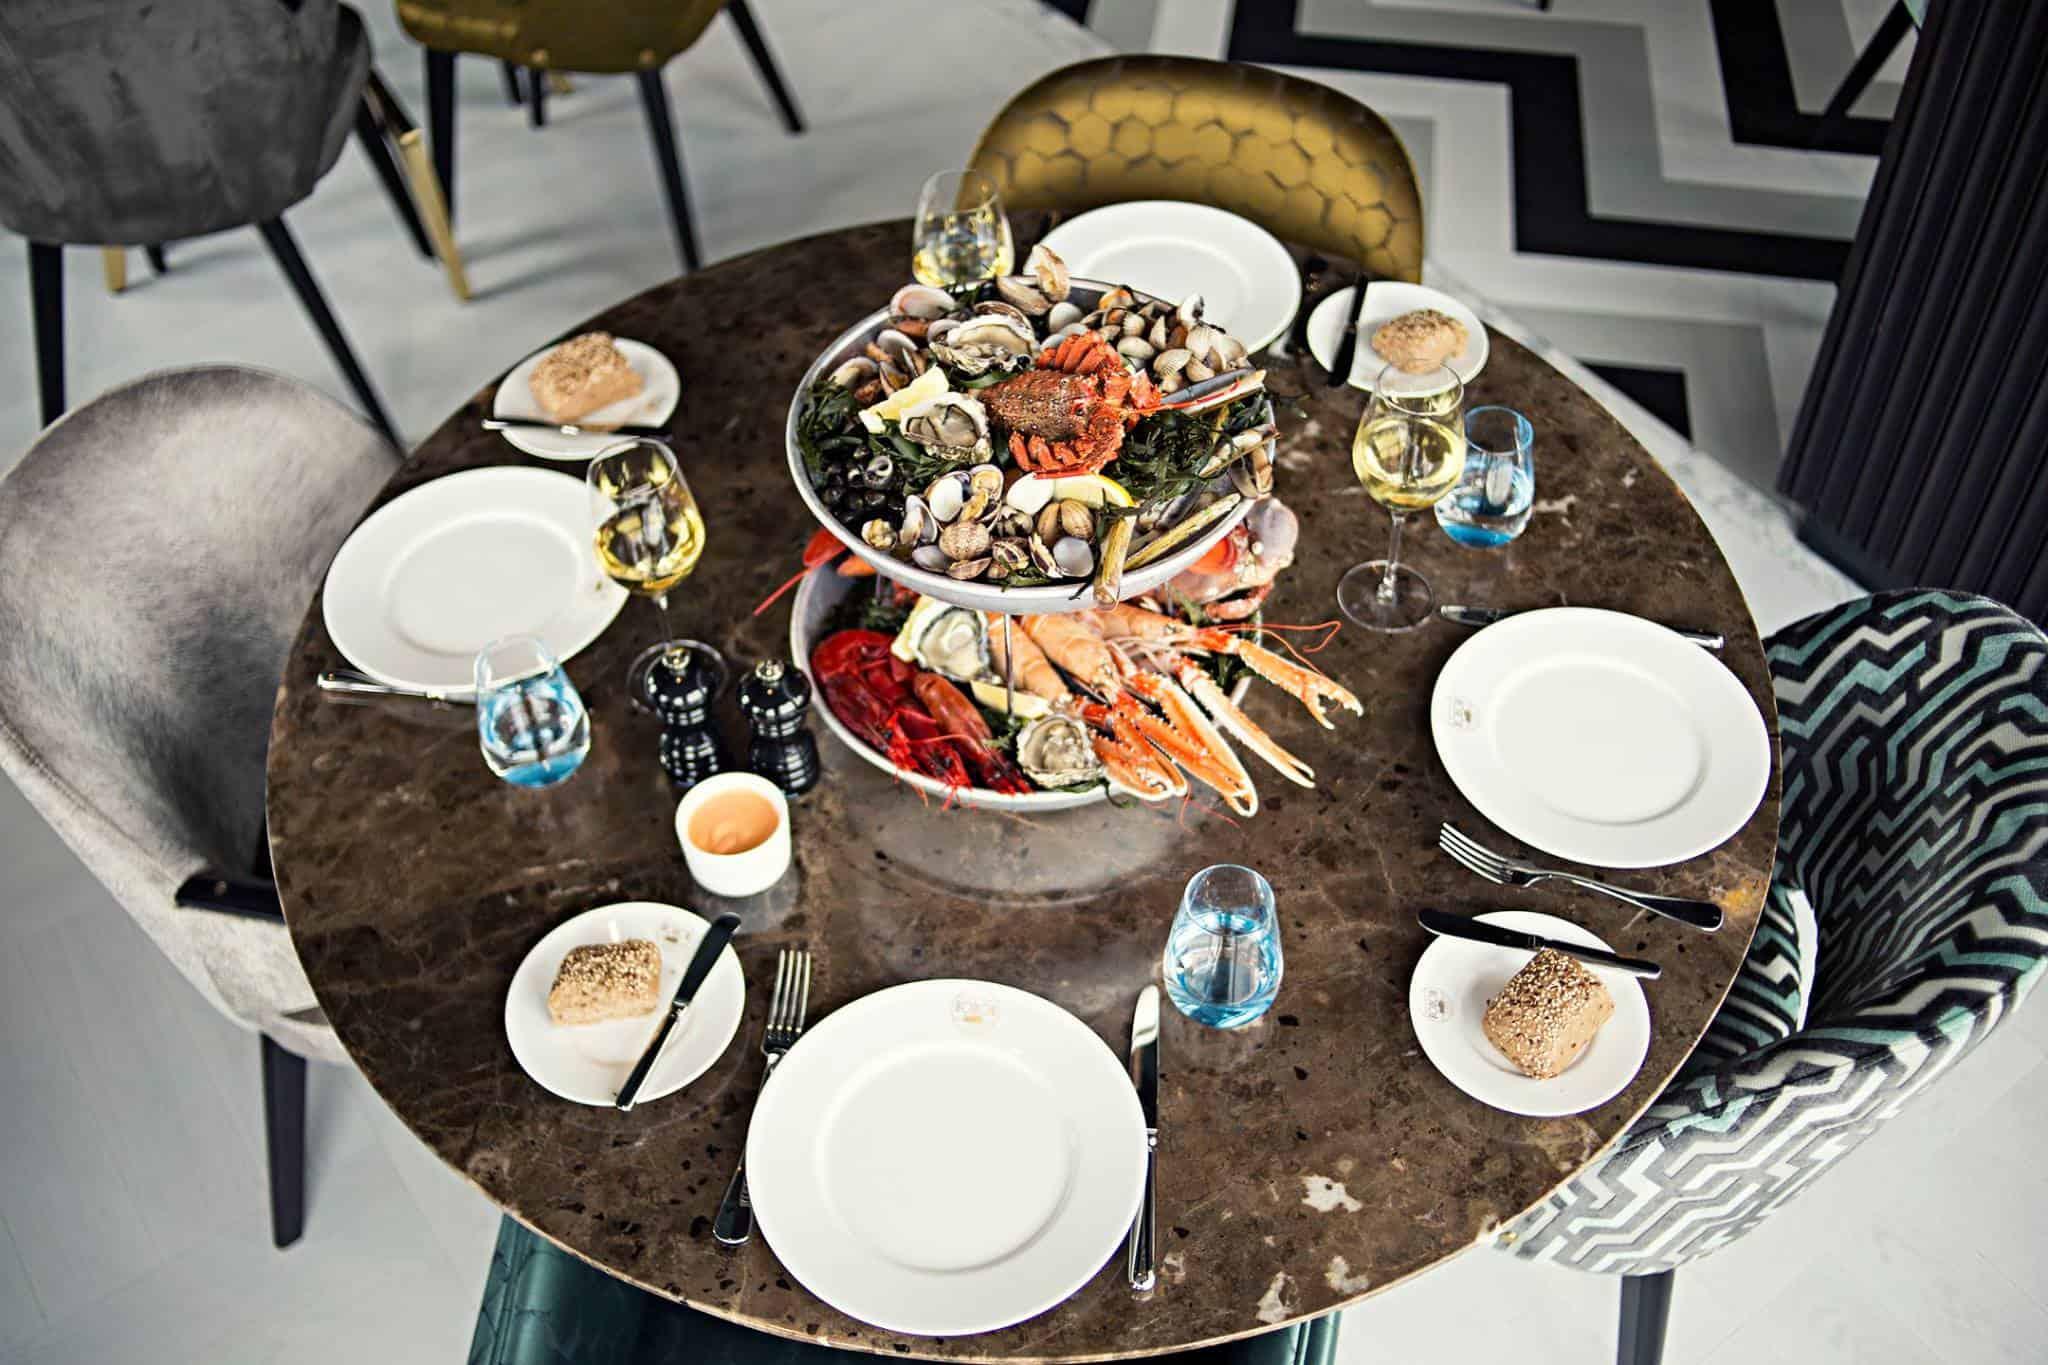 Visrestaurant - Amsterdam - Pesca